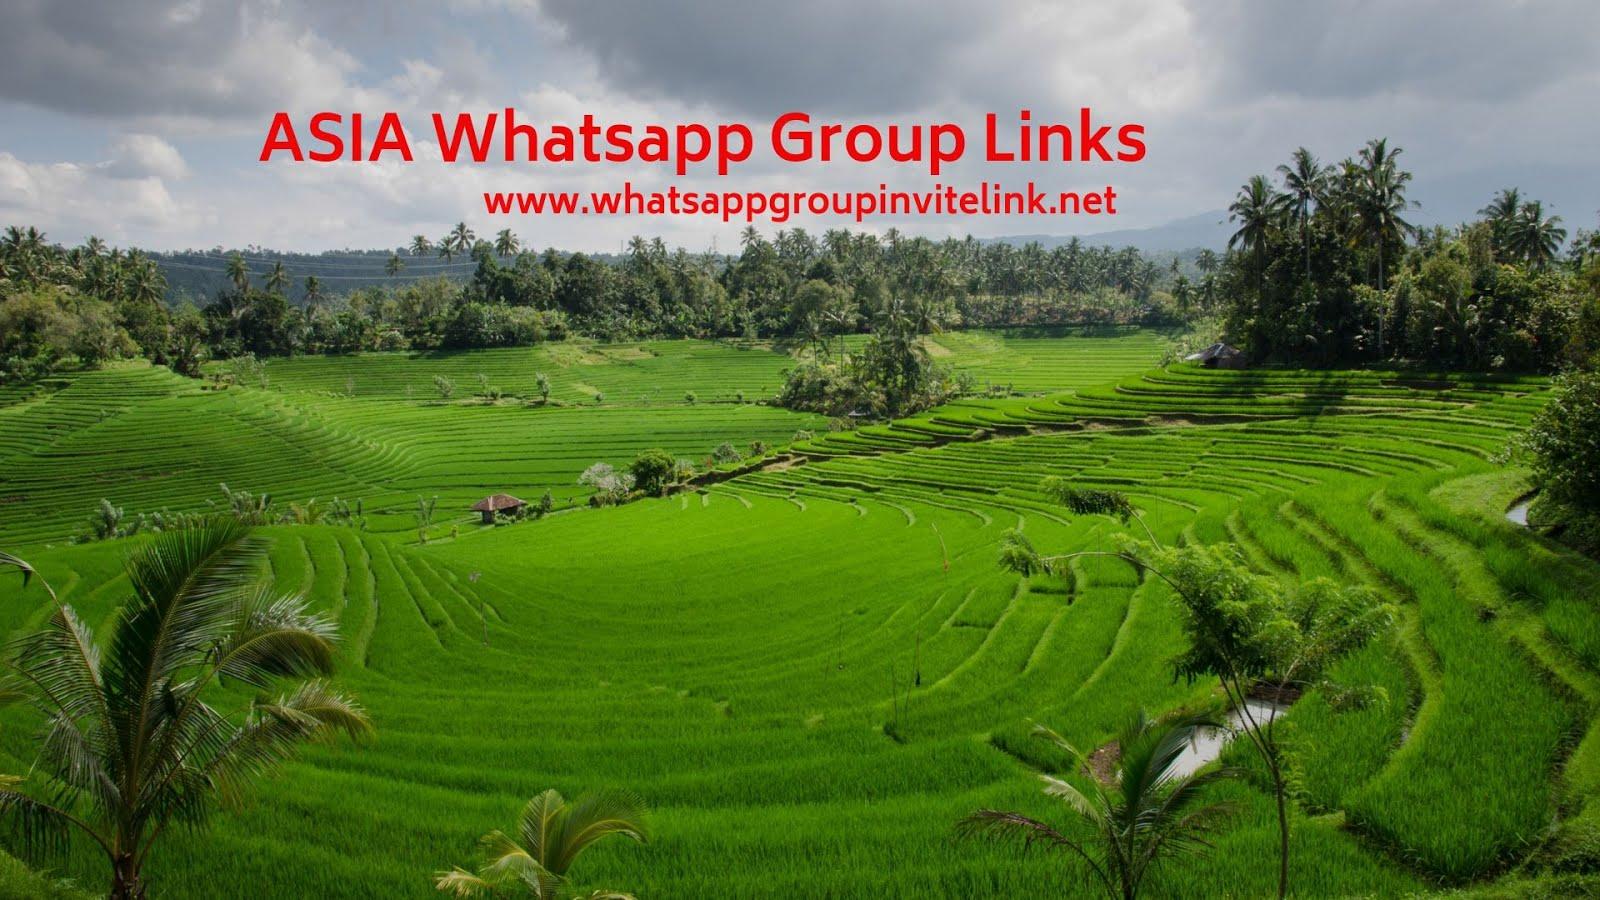 Whatsapp Group Invite Links: ASIA Whatsapp Group Links